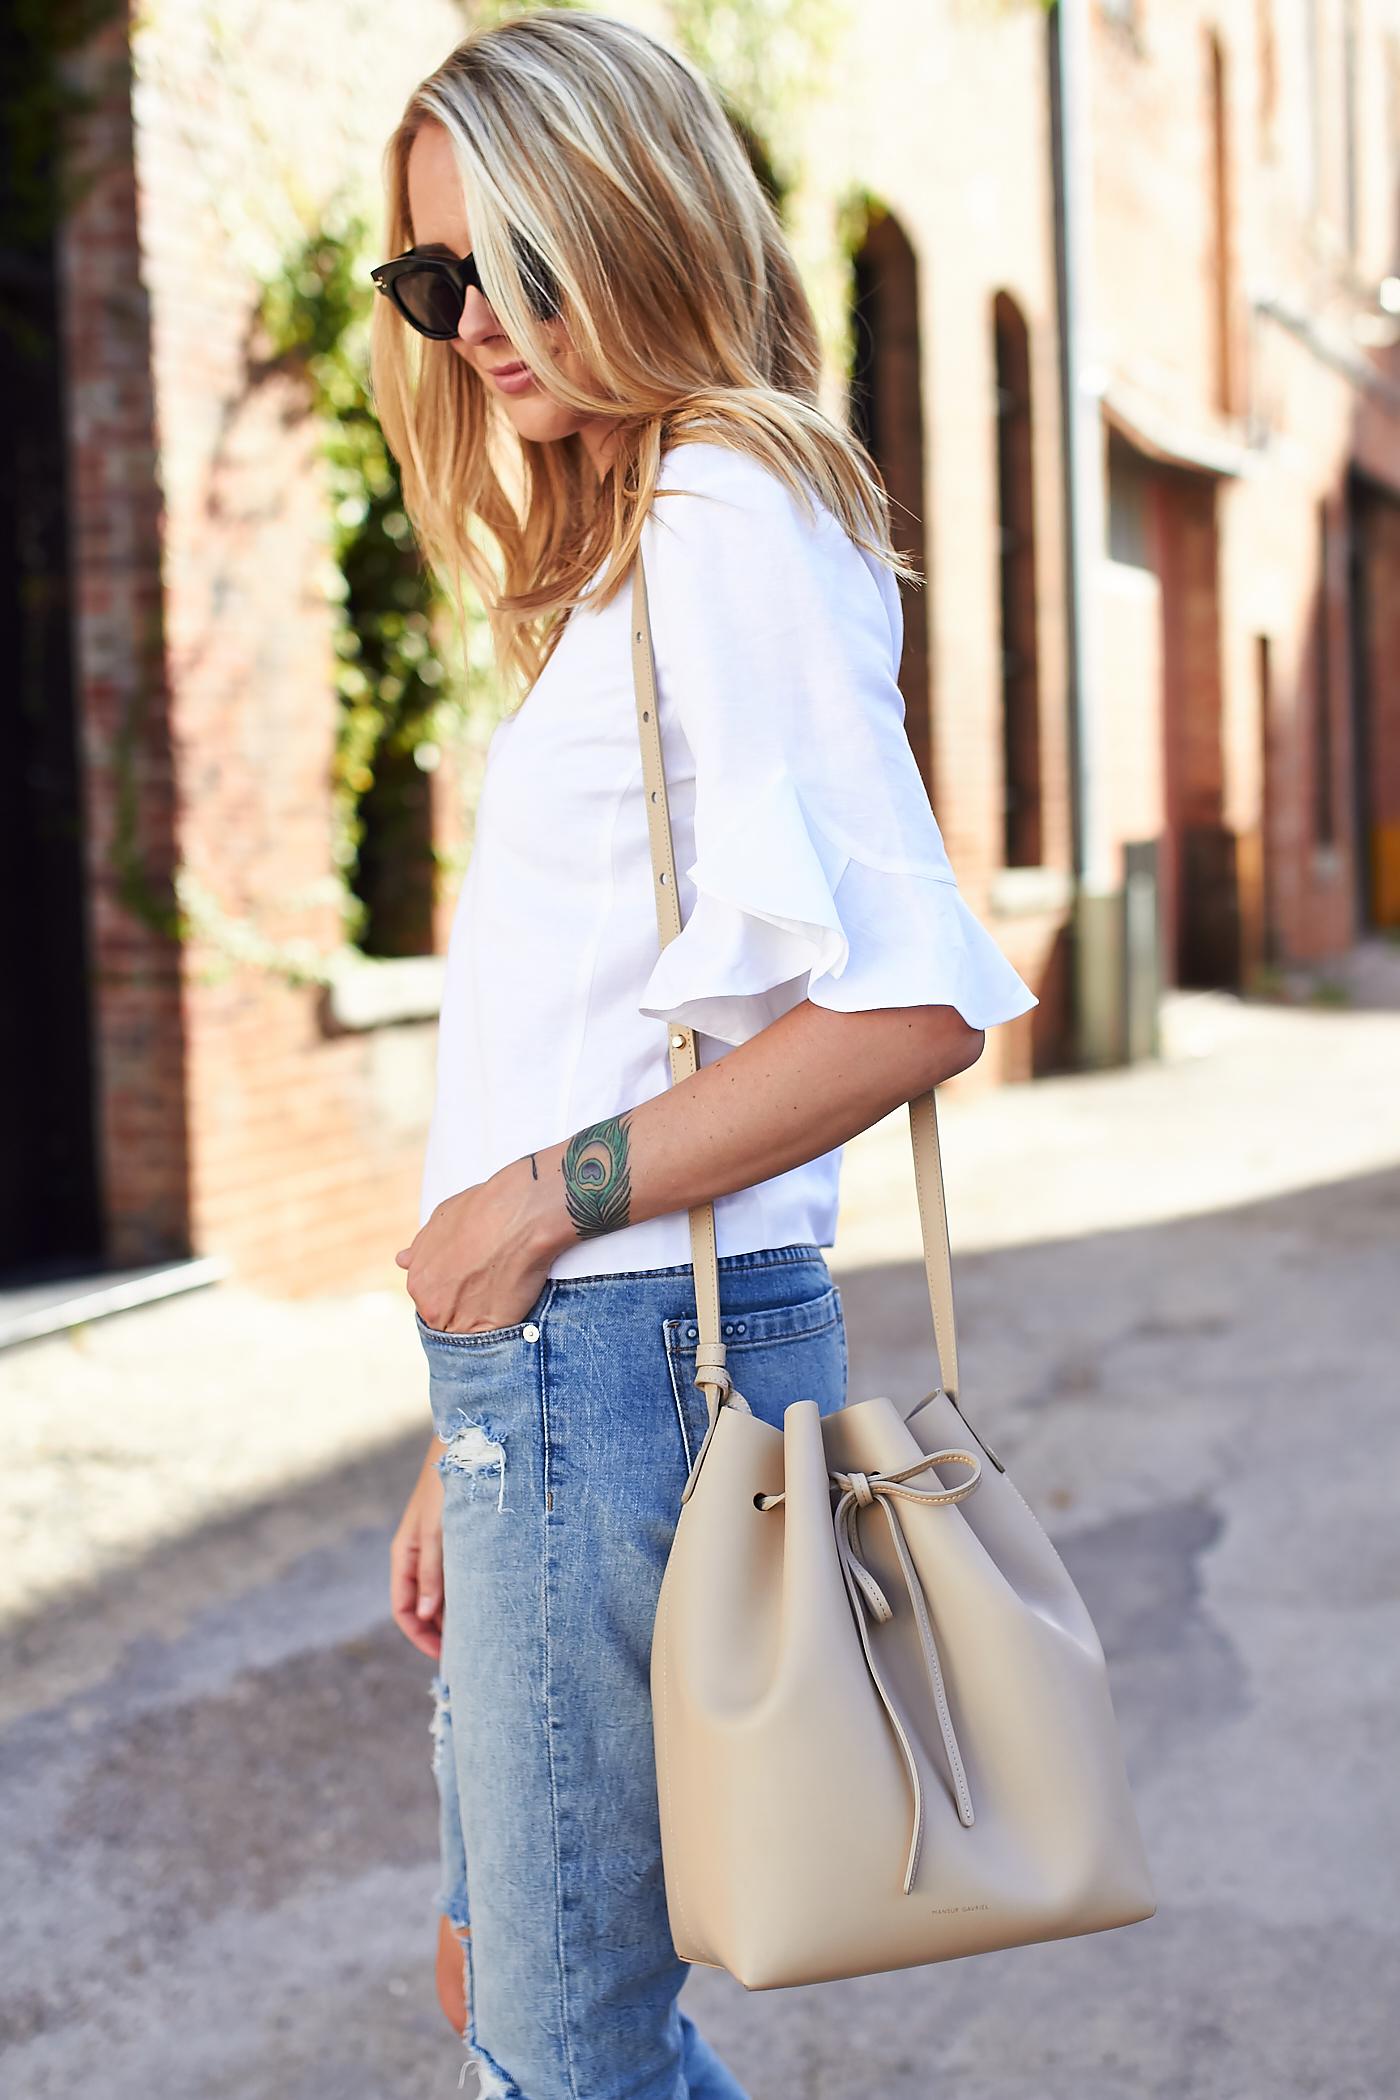 fashion-jackson-mansur-gavriel-large-bucket-bag